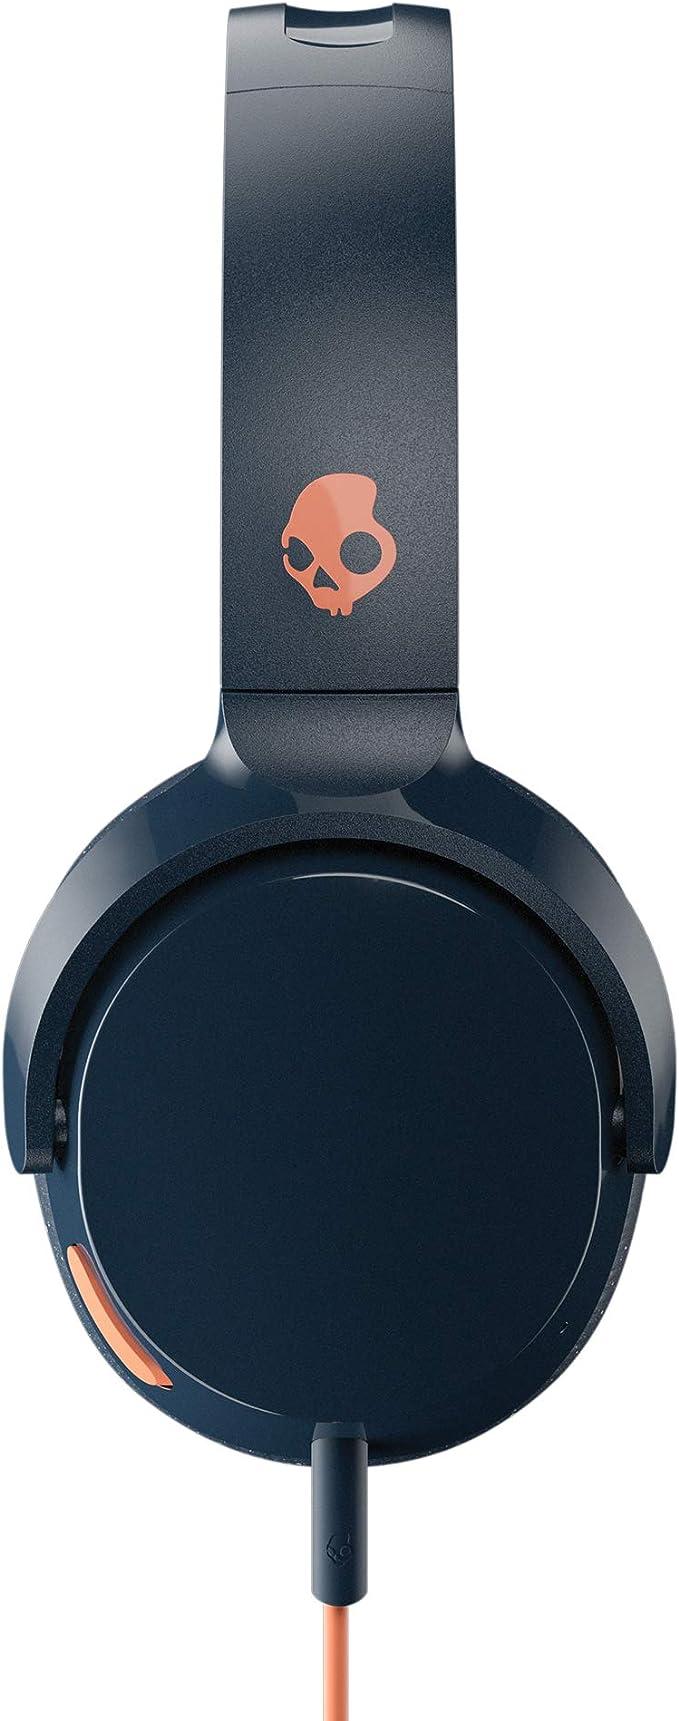 Skullcandy On-Ear HeadphonesBlue1.2m CordEx-Display